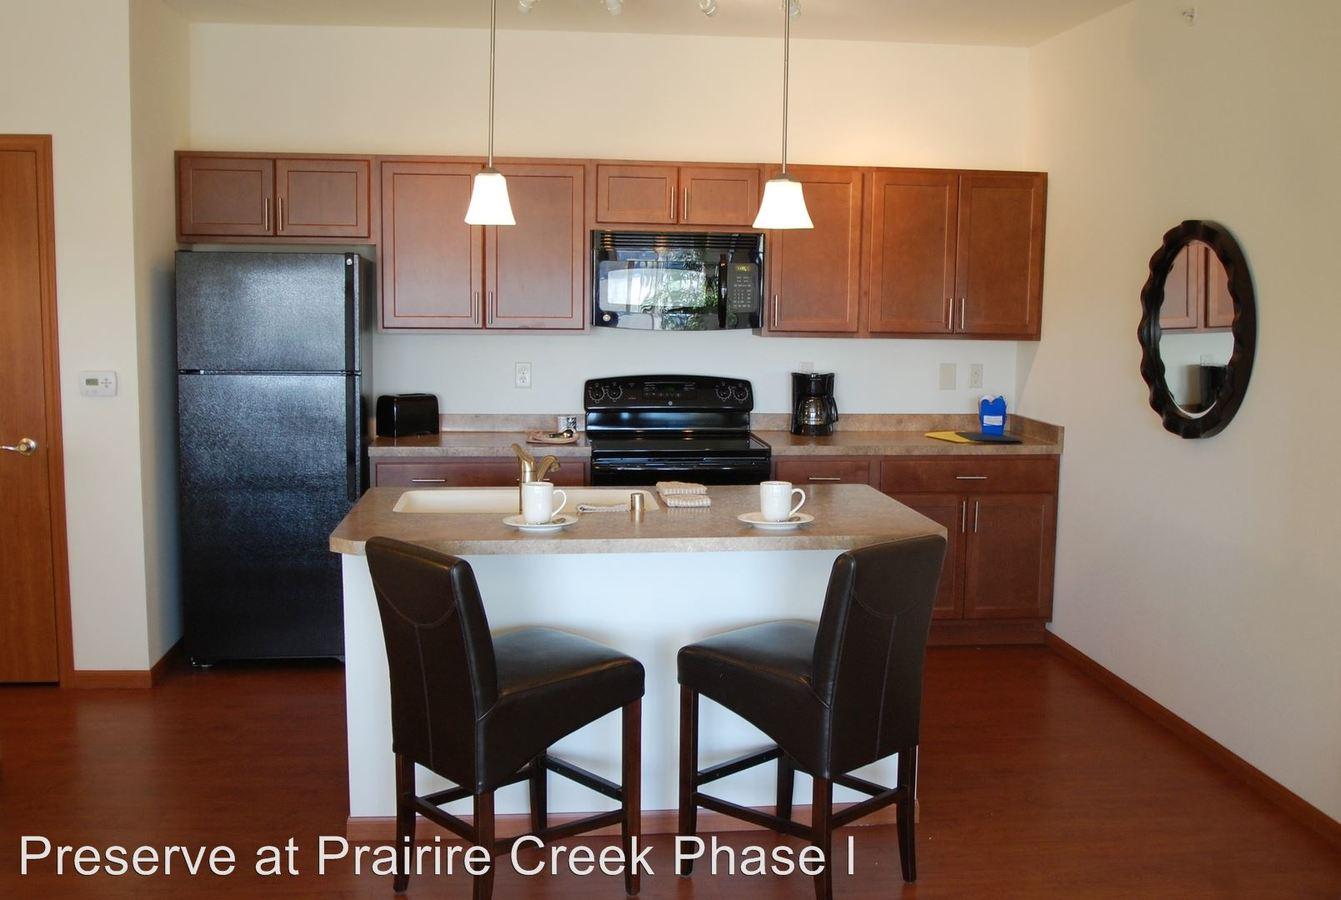 3 Bedrooms 2 Bathrooms Apartment for rent at 1230 Prairie Creek Blvd in Oconomowoc, WI